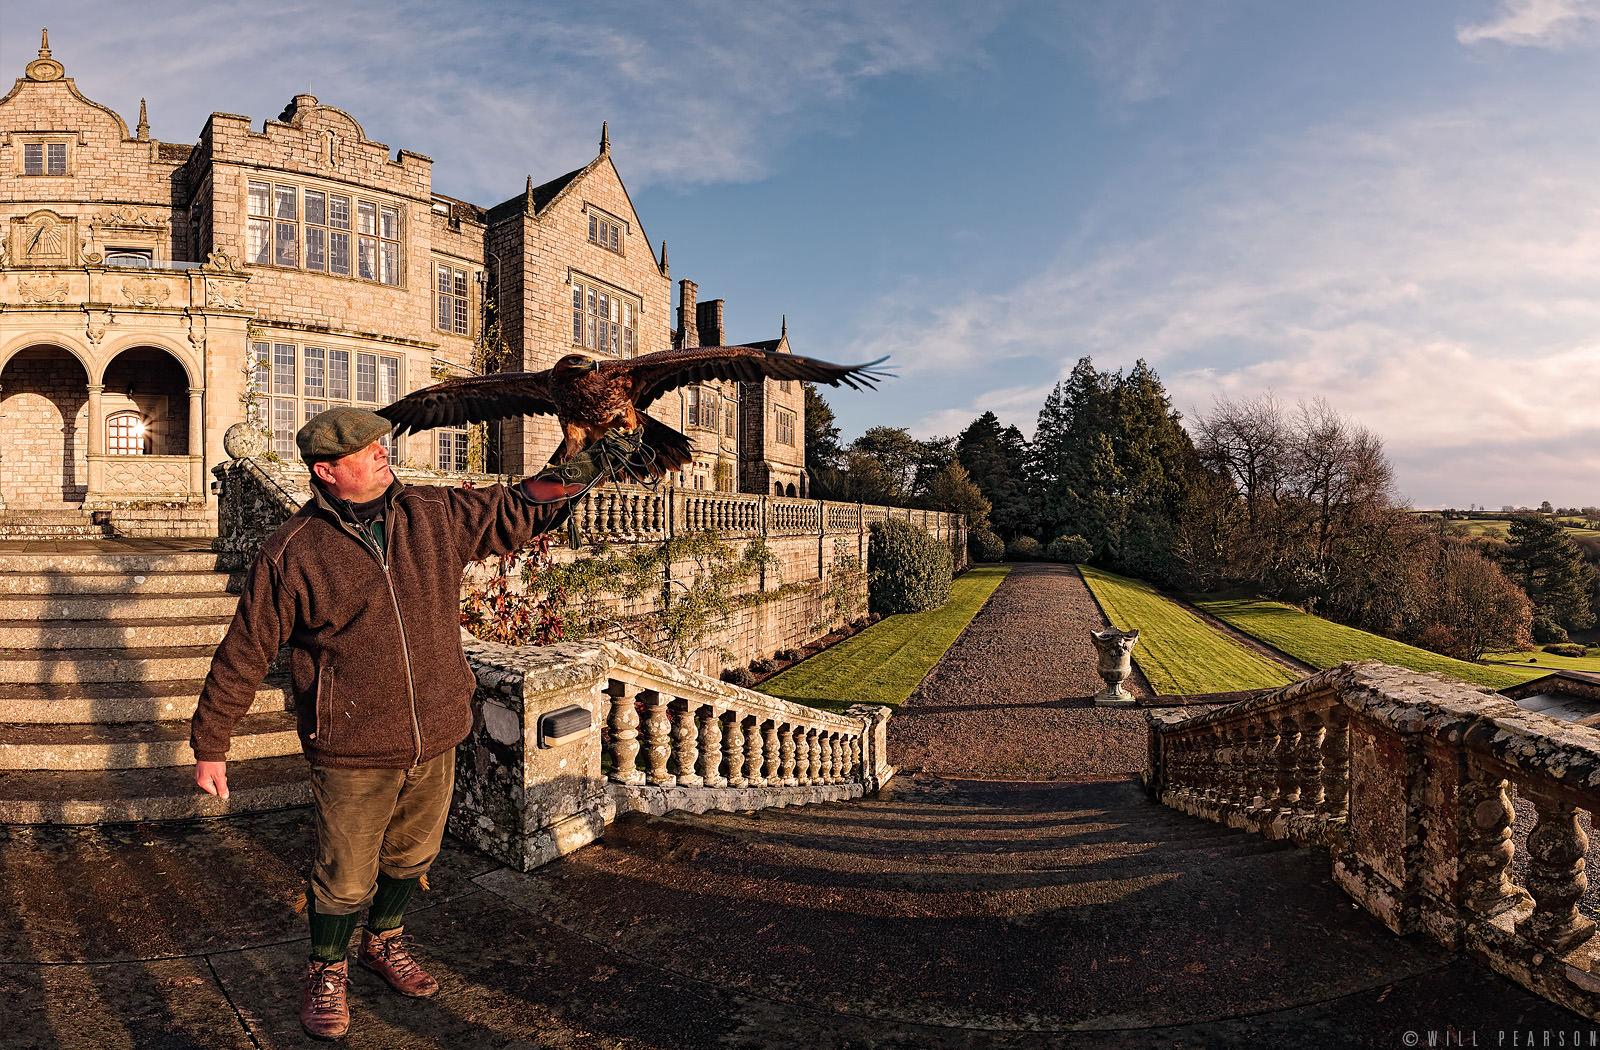 Artemis the Eagle at Bovey Castle